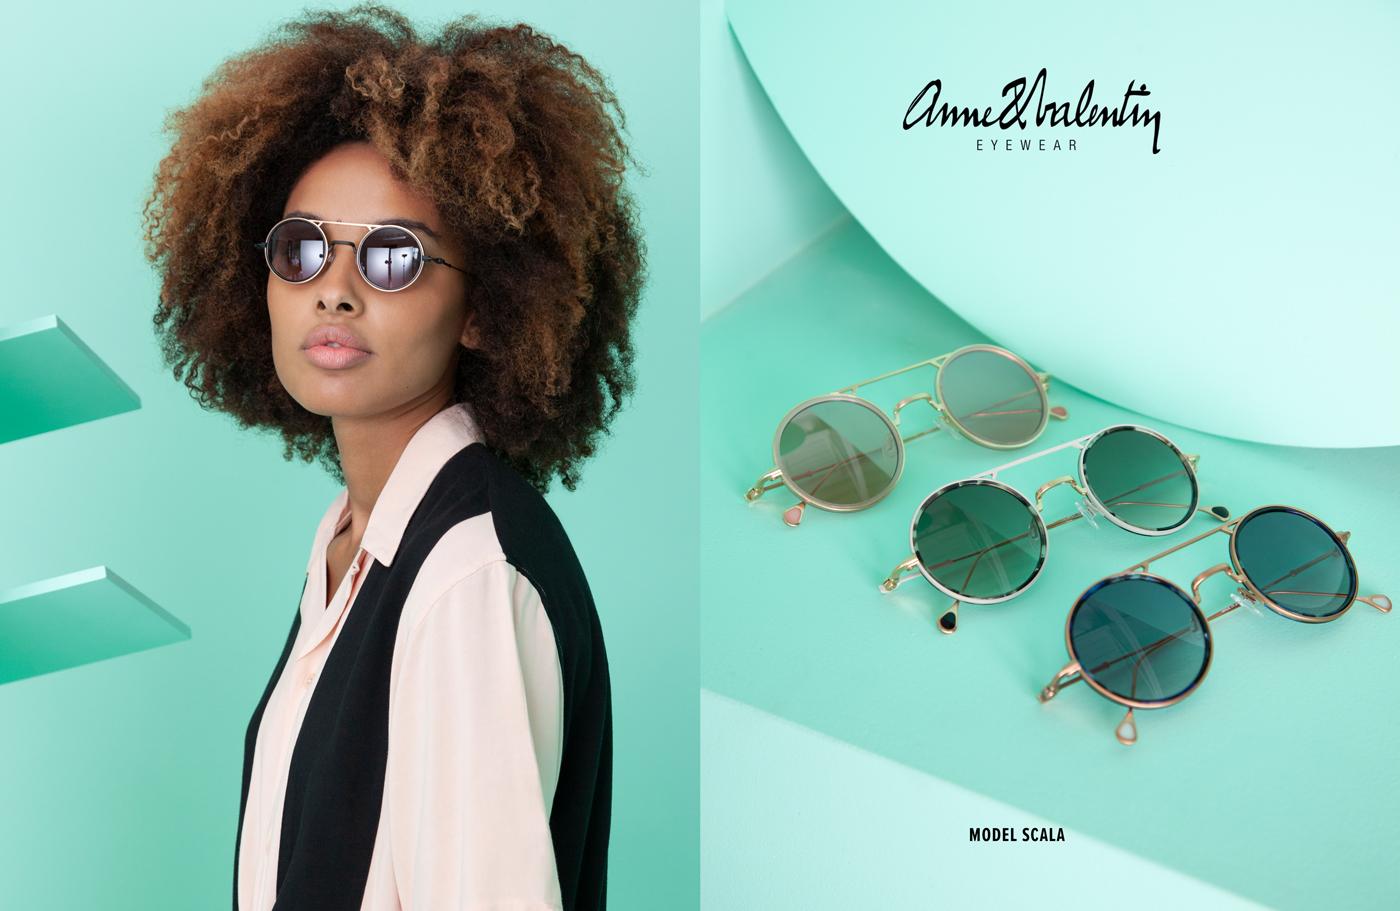 Anne et Valentin key sunglass styles 2021 Collection